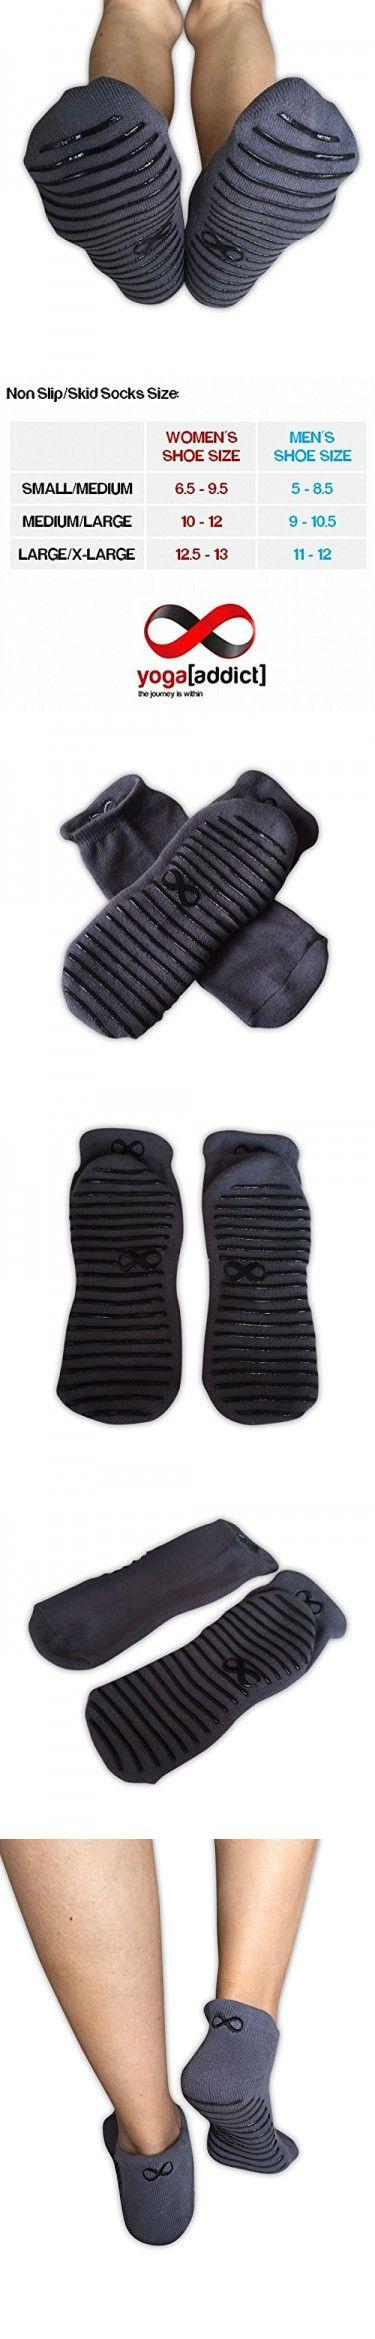 Non Slip Socks, Grey (Black Grippy Lines) - Size L/XL